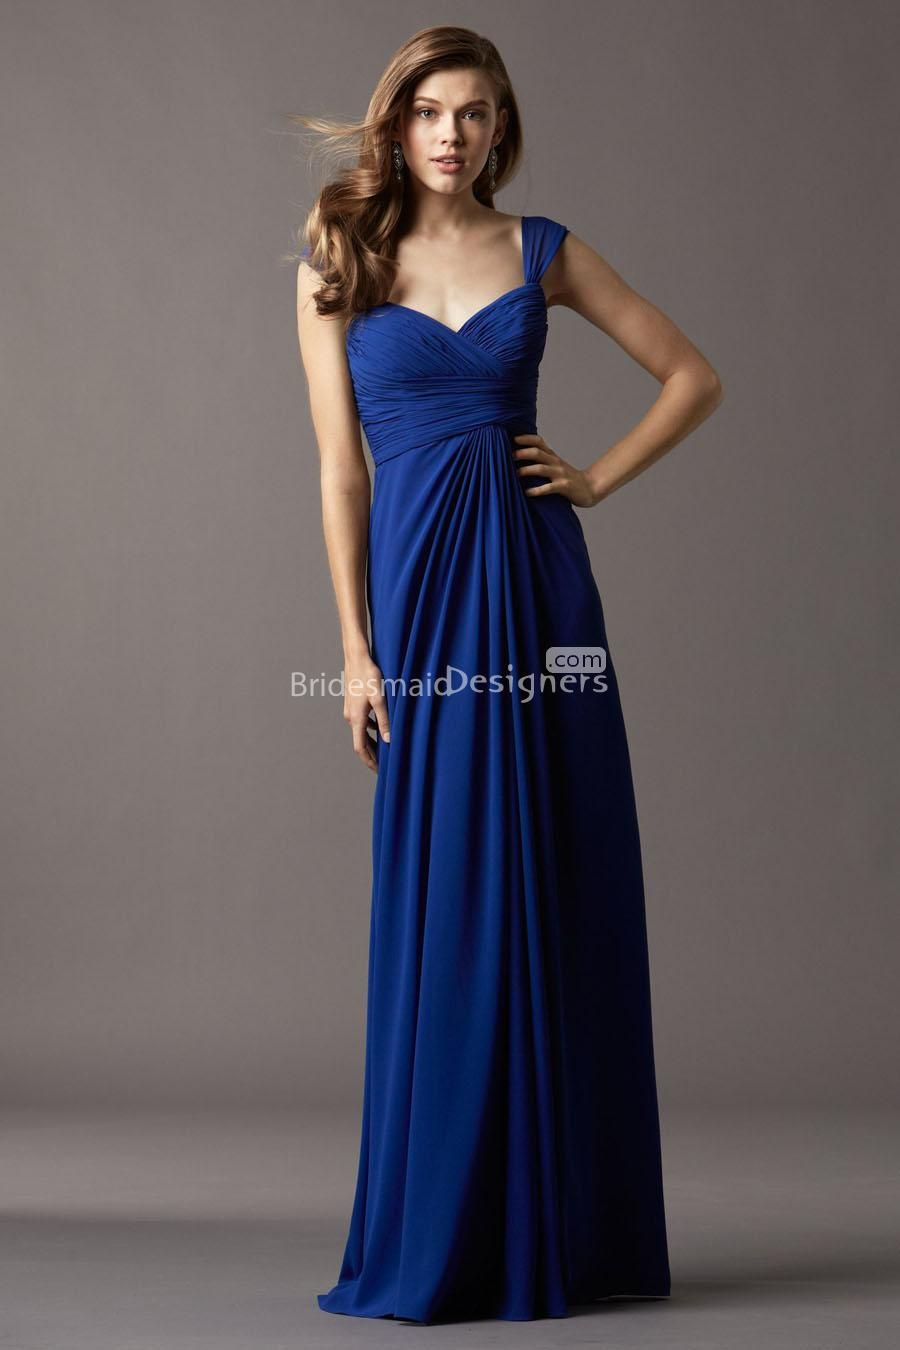 Most brides will choose both chiffon wedding dresses and chiffon